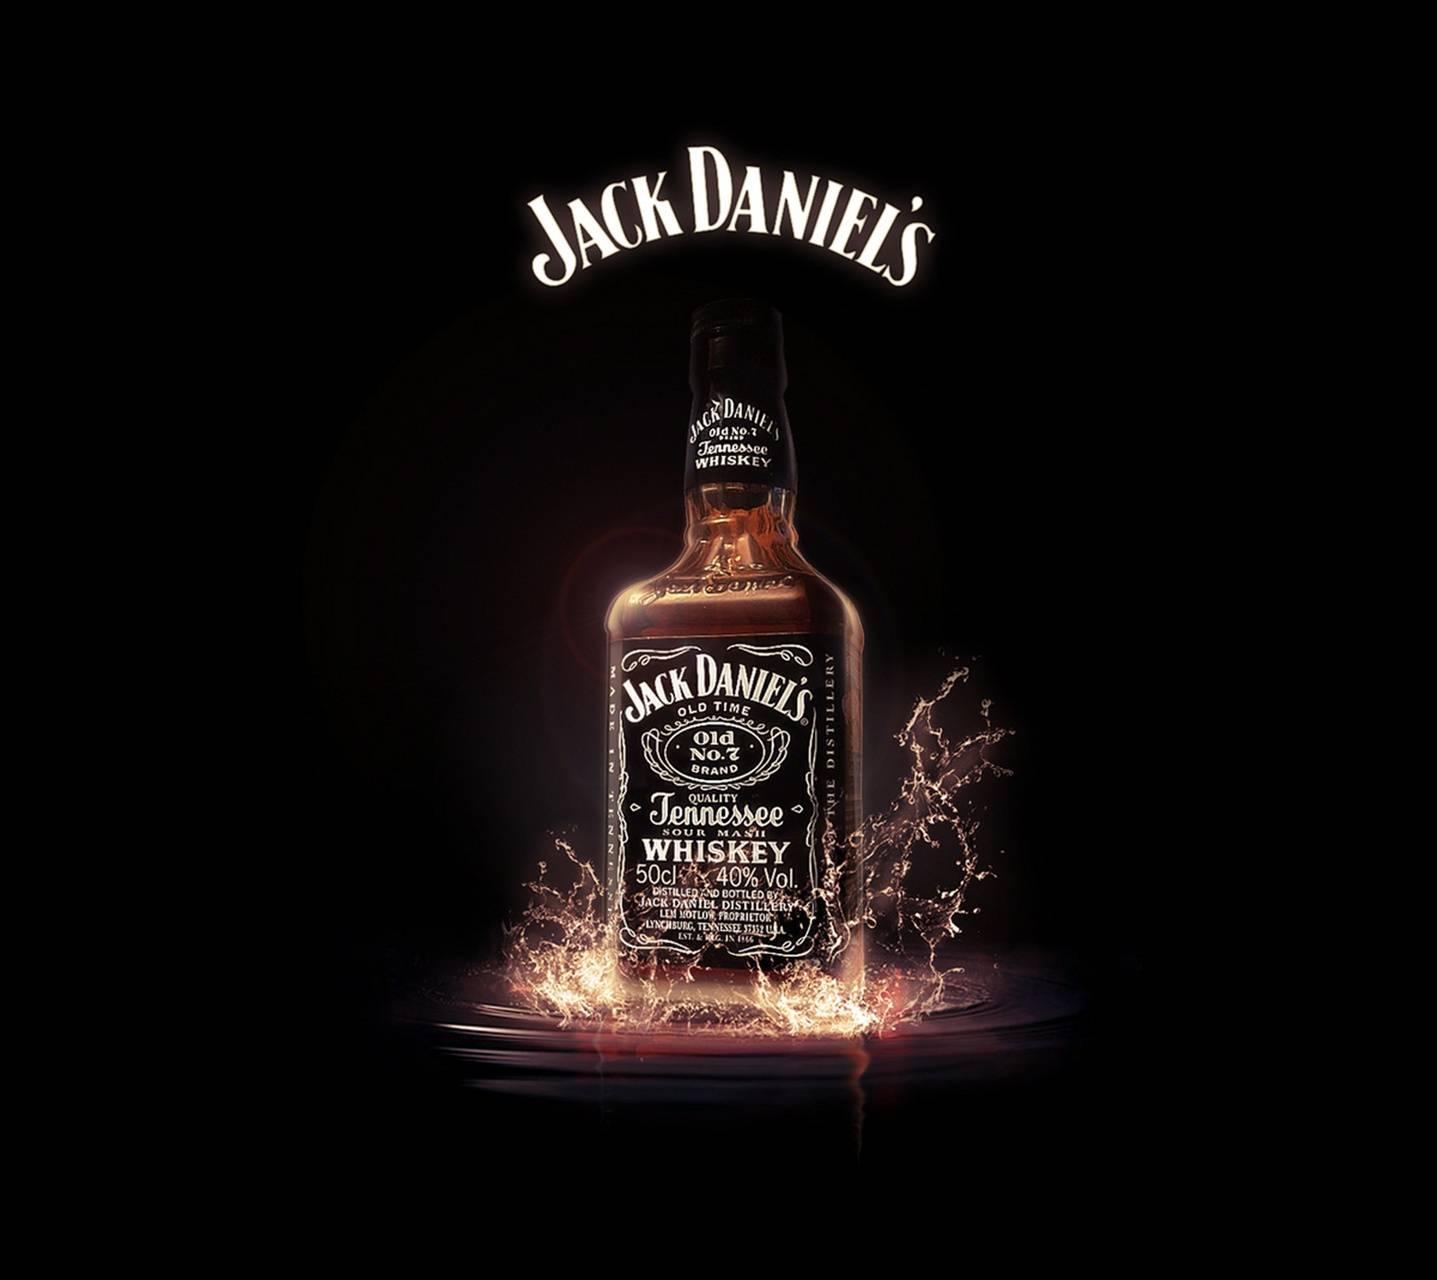 Jack Daniels 9